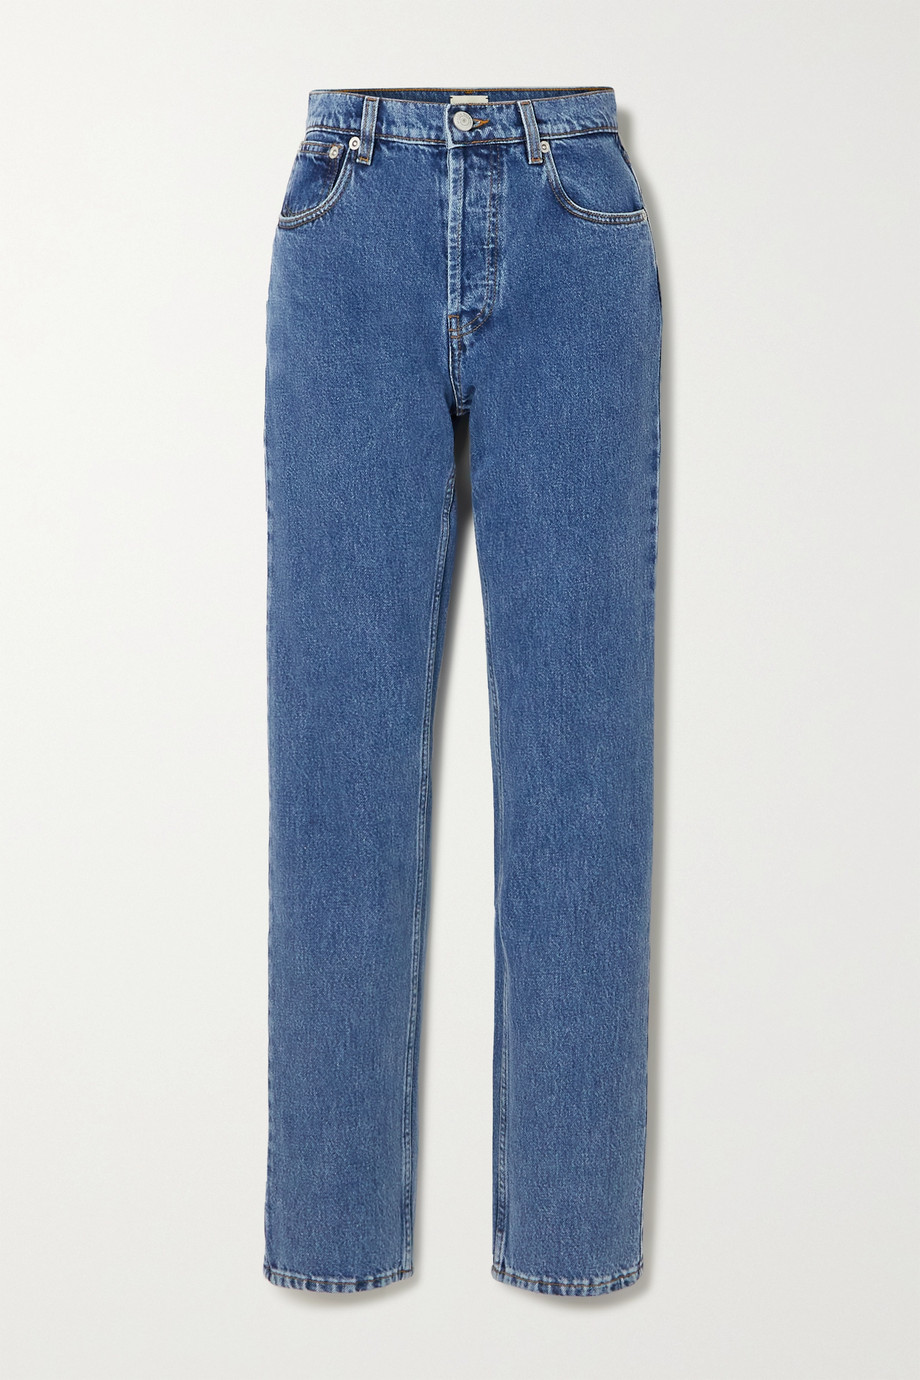 Magda Butrym High-rise slim-leg jeans